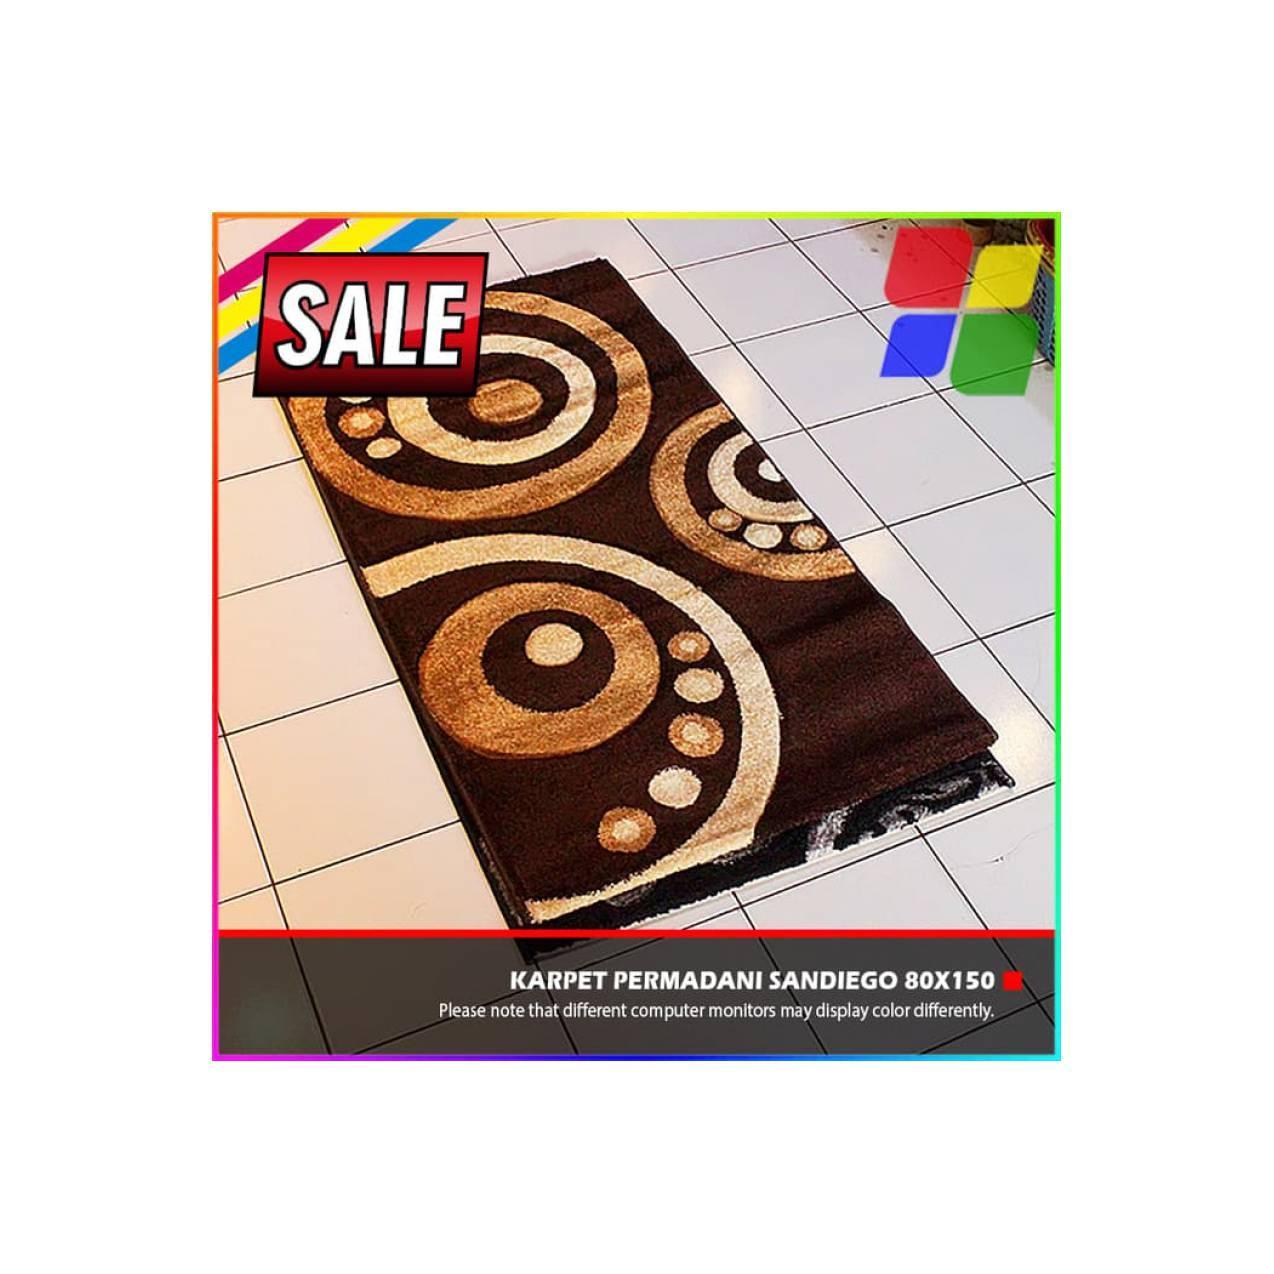 PROMO Karpet Permadani Import Sandiego 80x150cm Dekorasi Rumah Murah